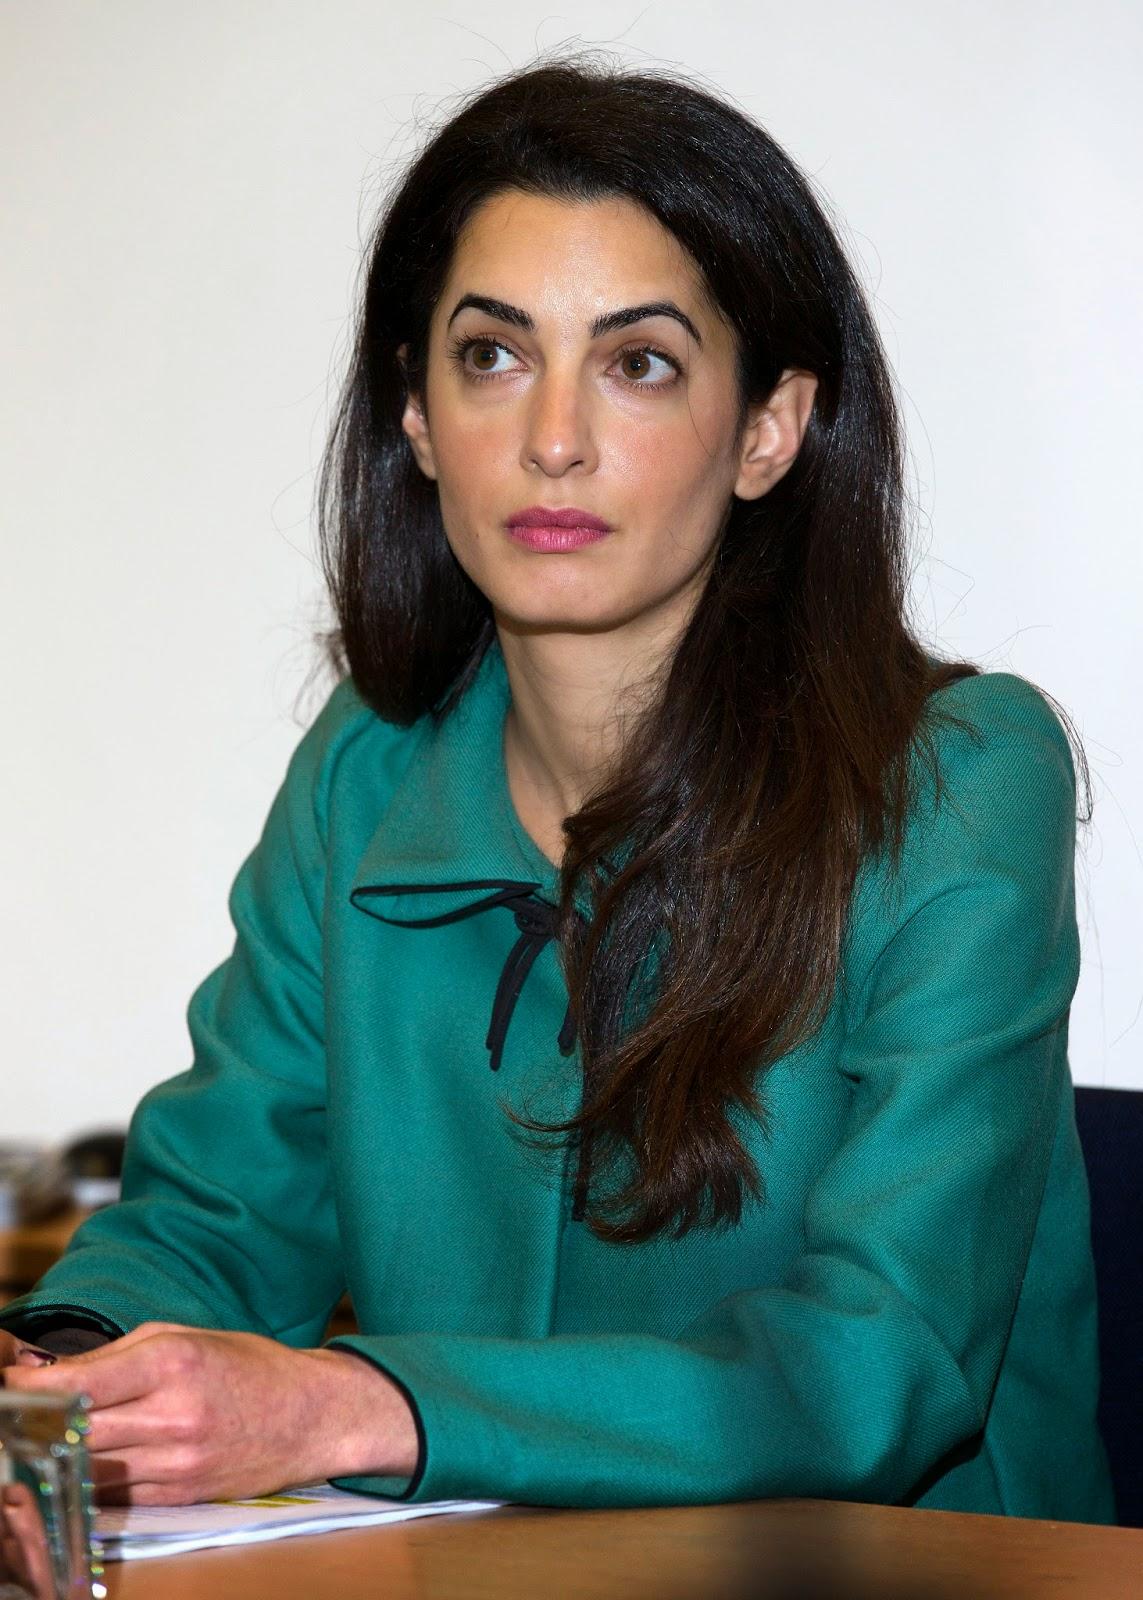 Amal Alamuddin, Britain Lawyer, British lawyer, Entertainment, George and Amal, George Clooney, George Clooney Girlfriend, Hollywood, Hollywood Actor, Oscar-winner, Showbiz,